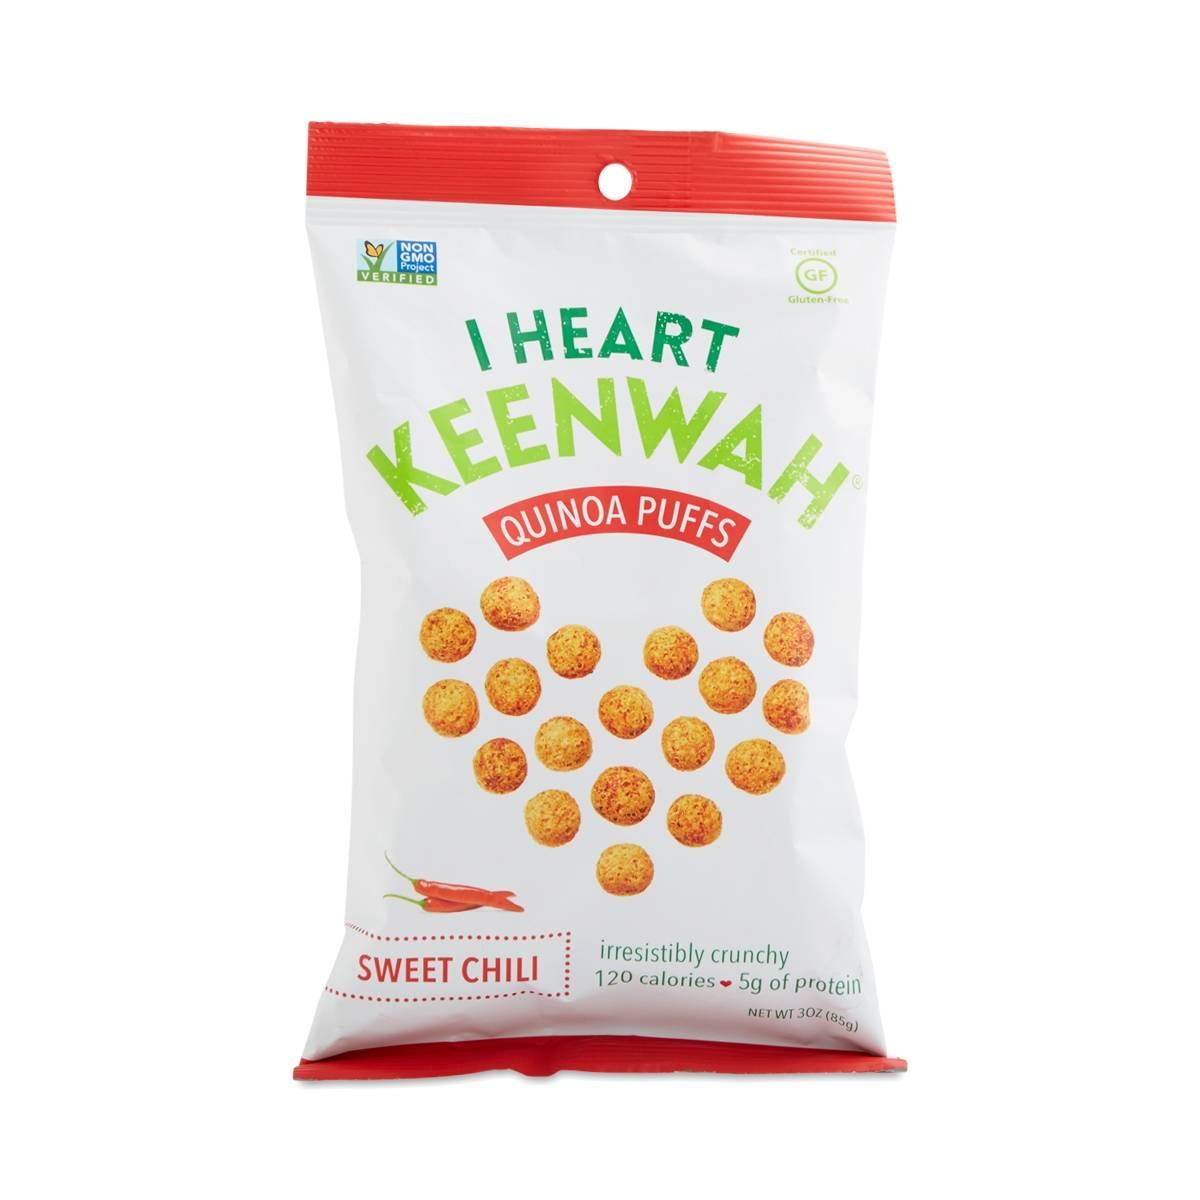 I Heart Keenwah Sweet Chili Quinoa Puffs - Thrive Market